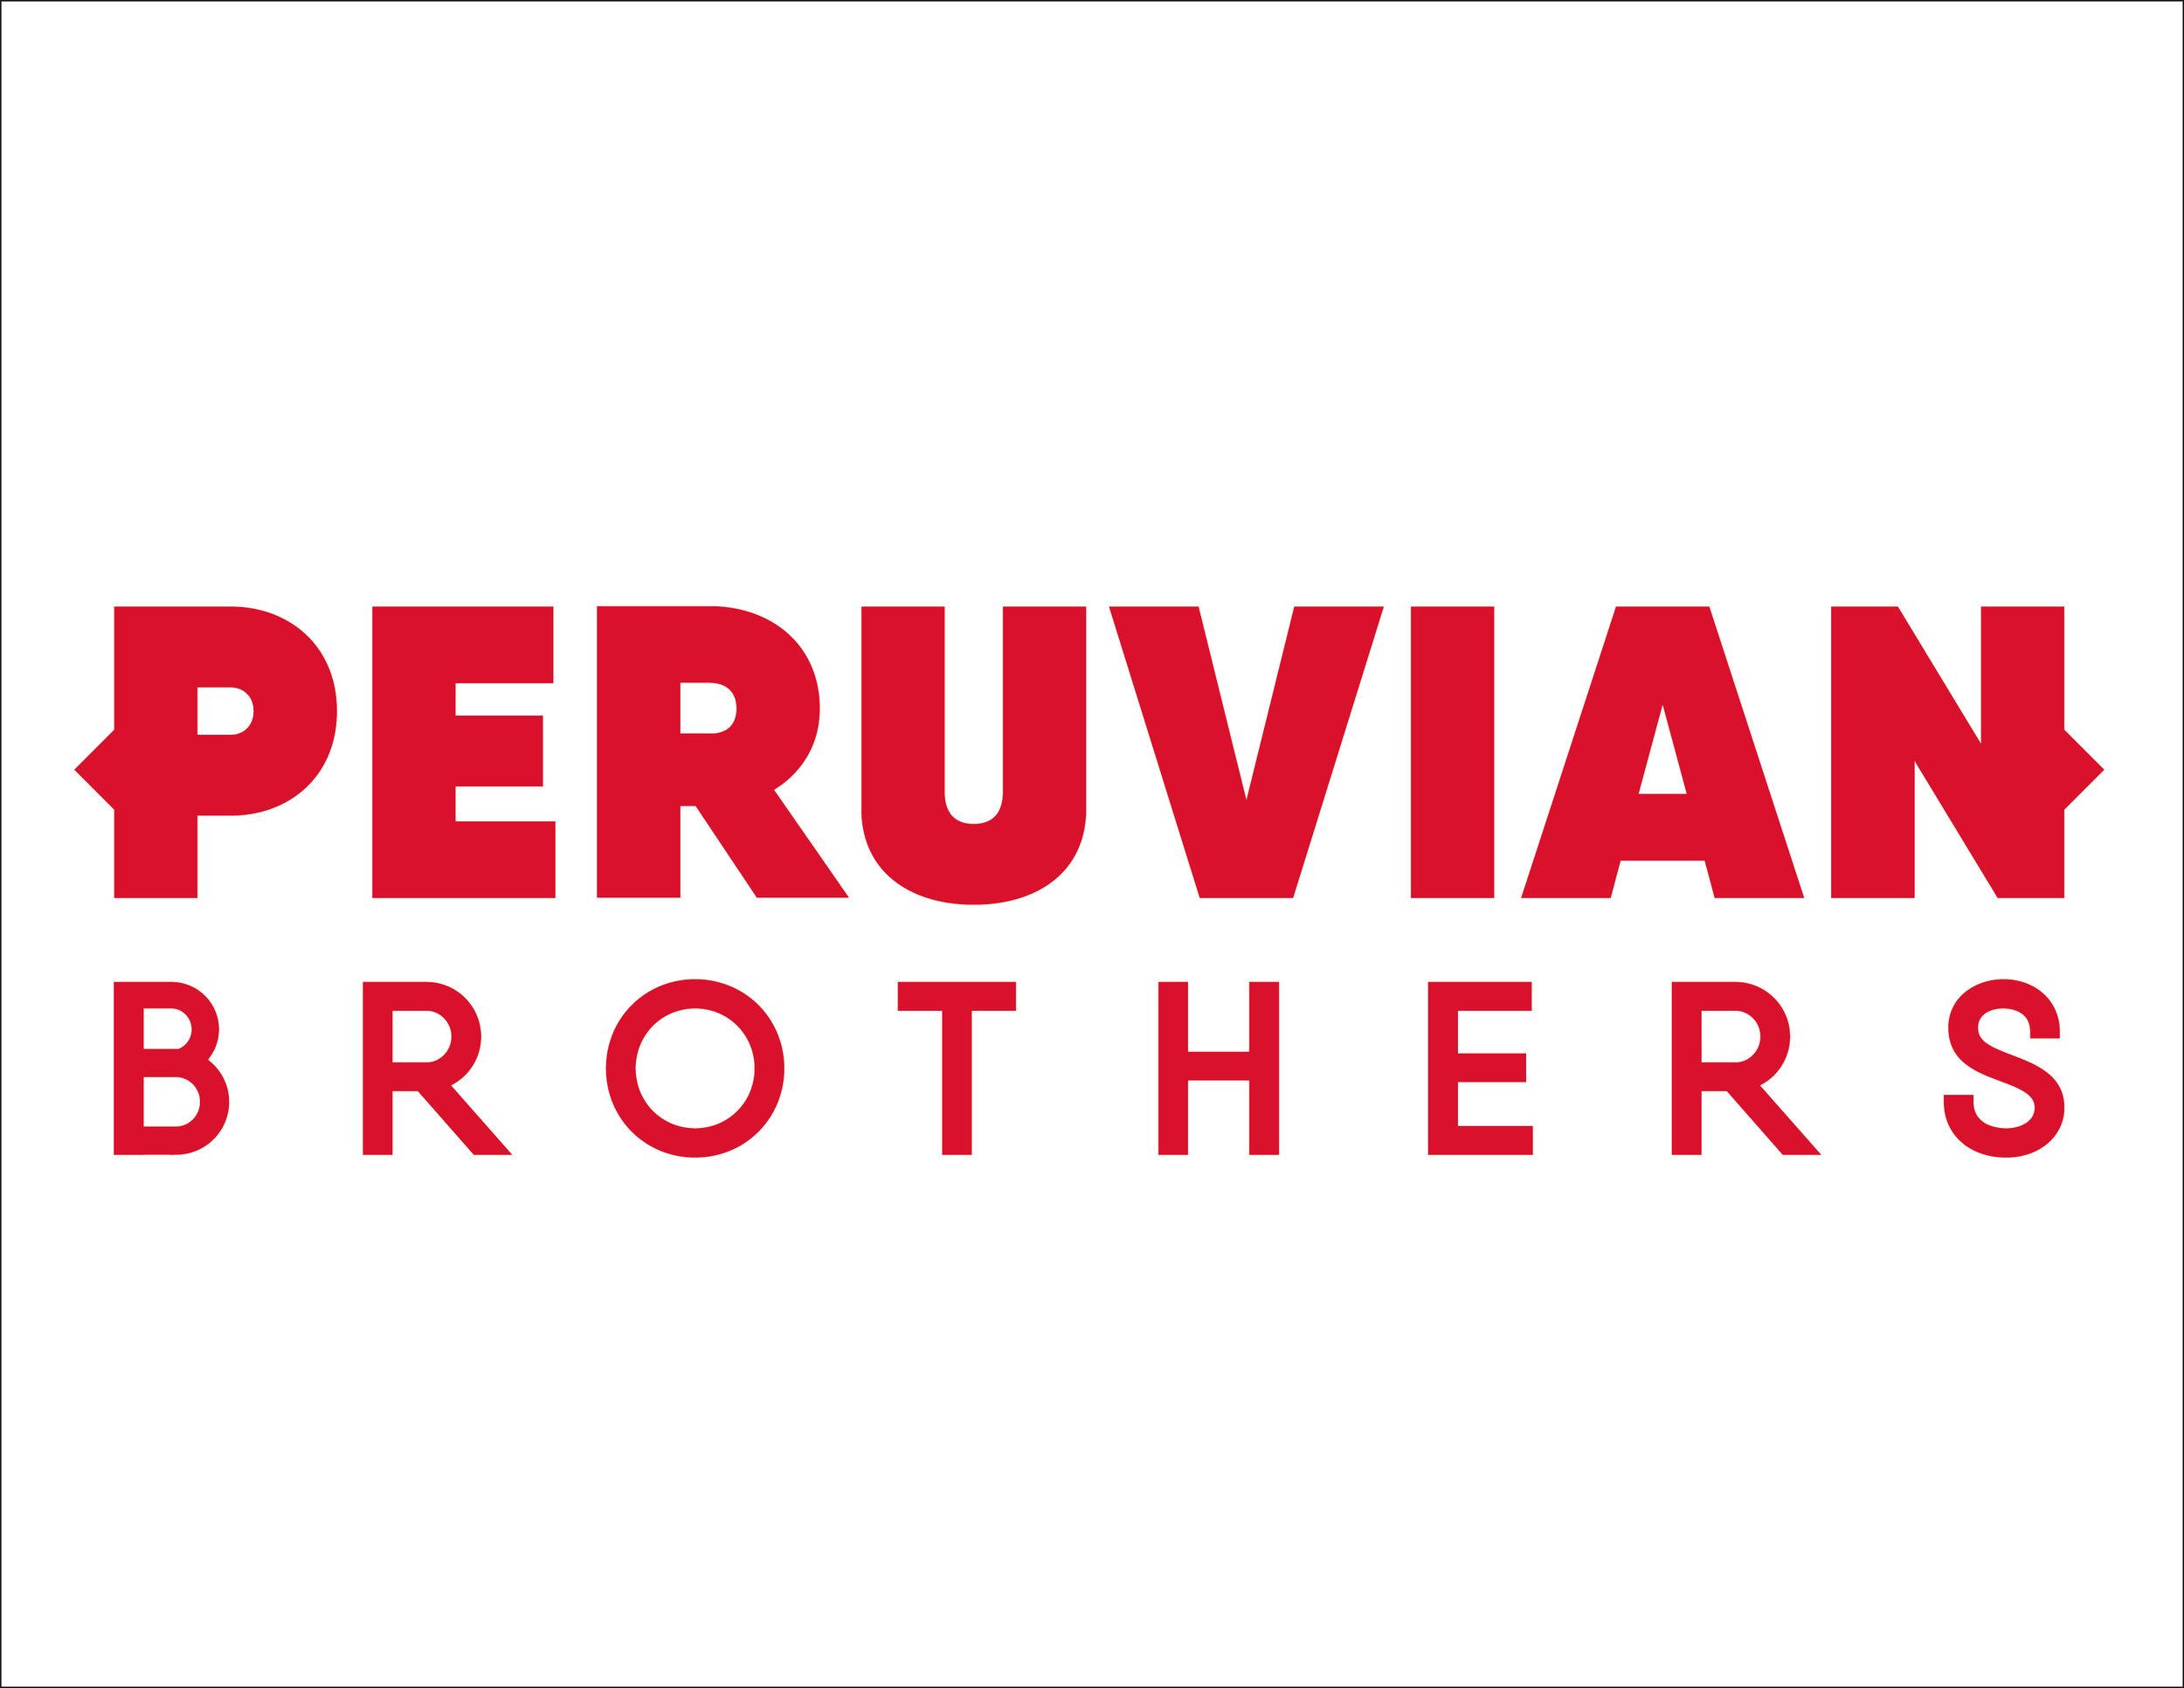 peruvian brothers.jpg